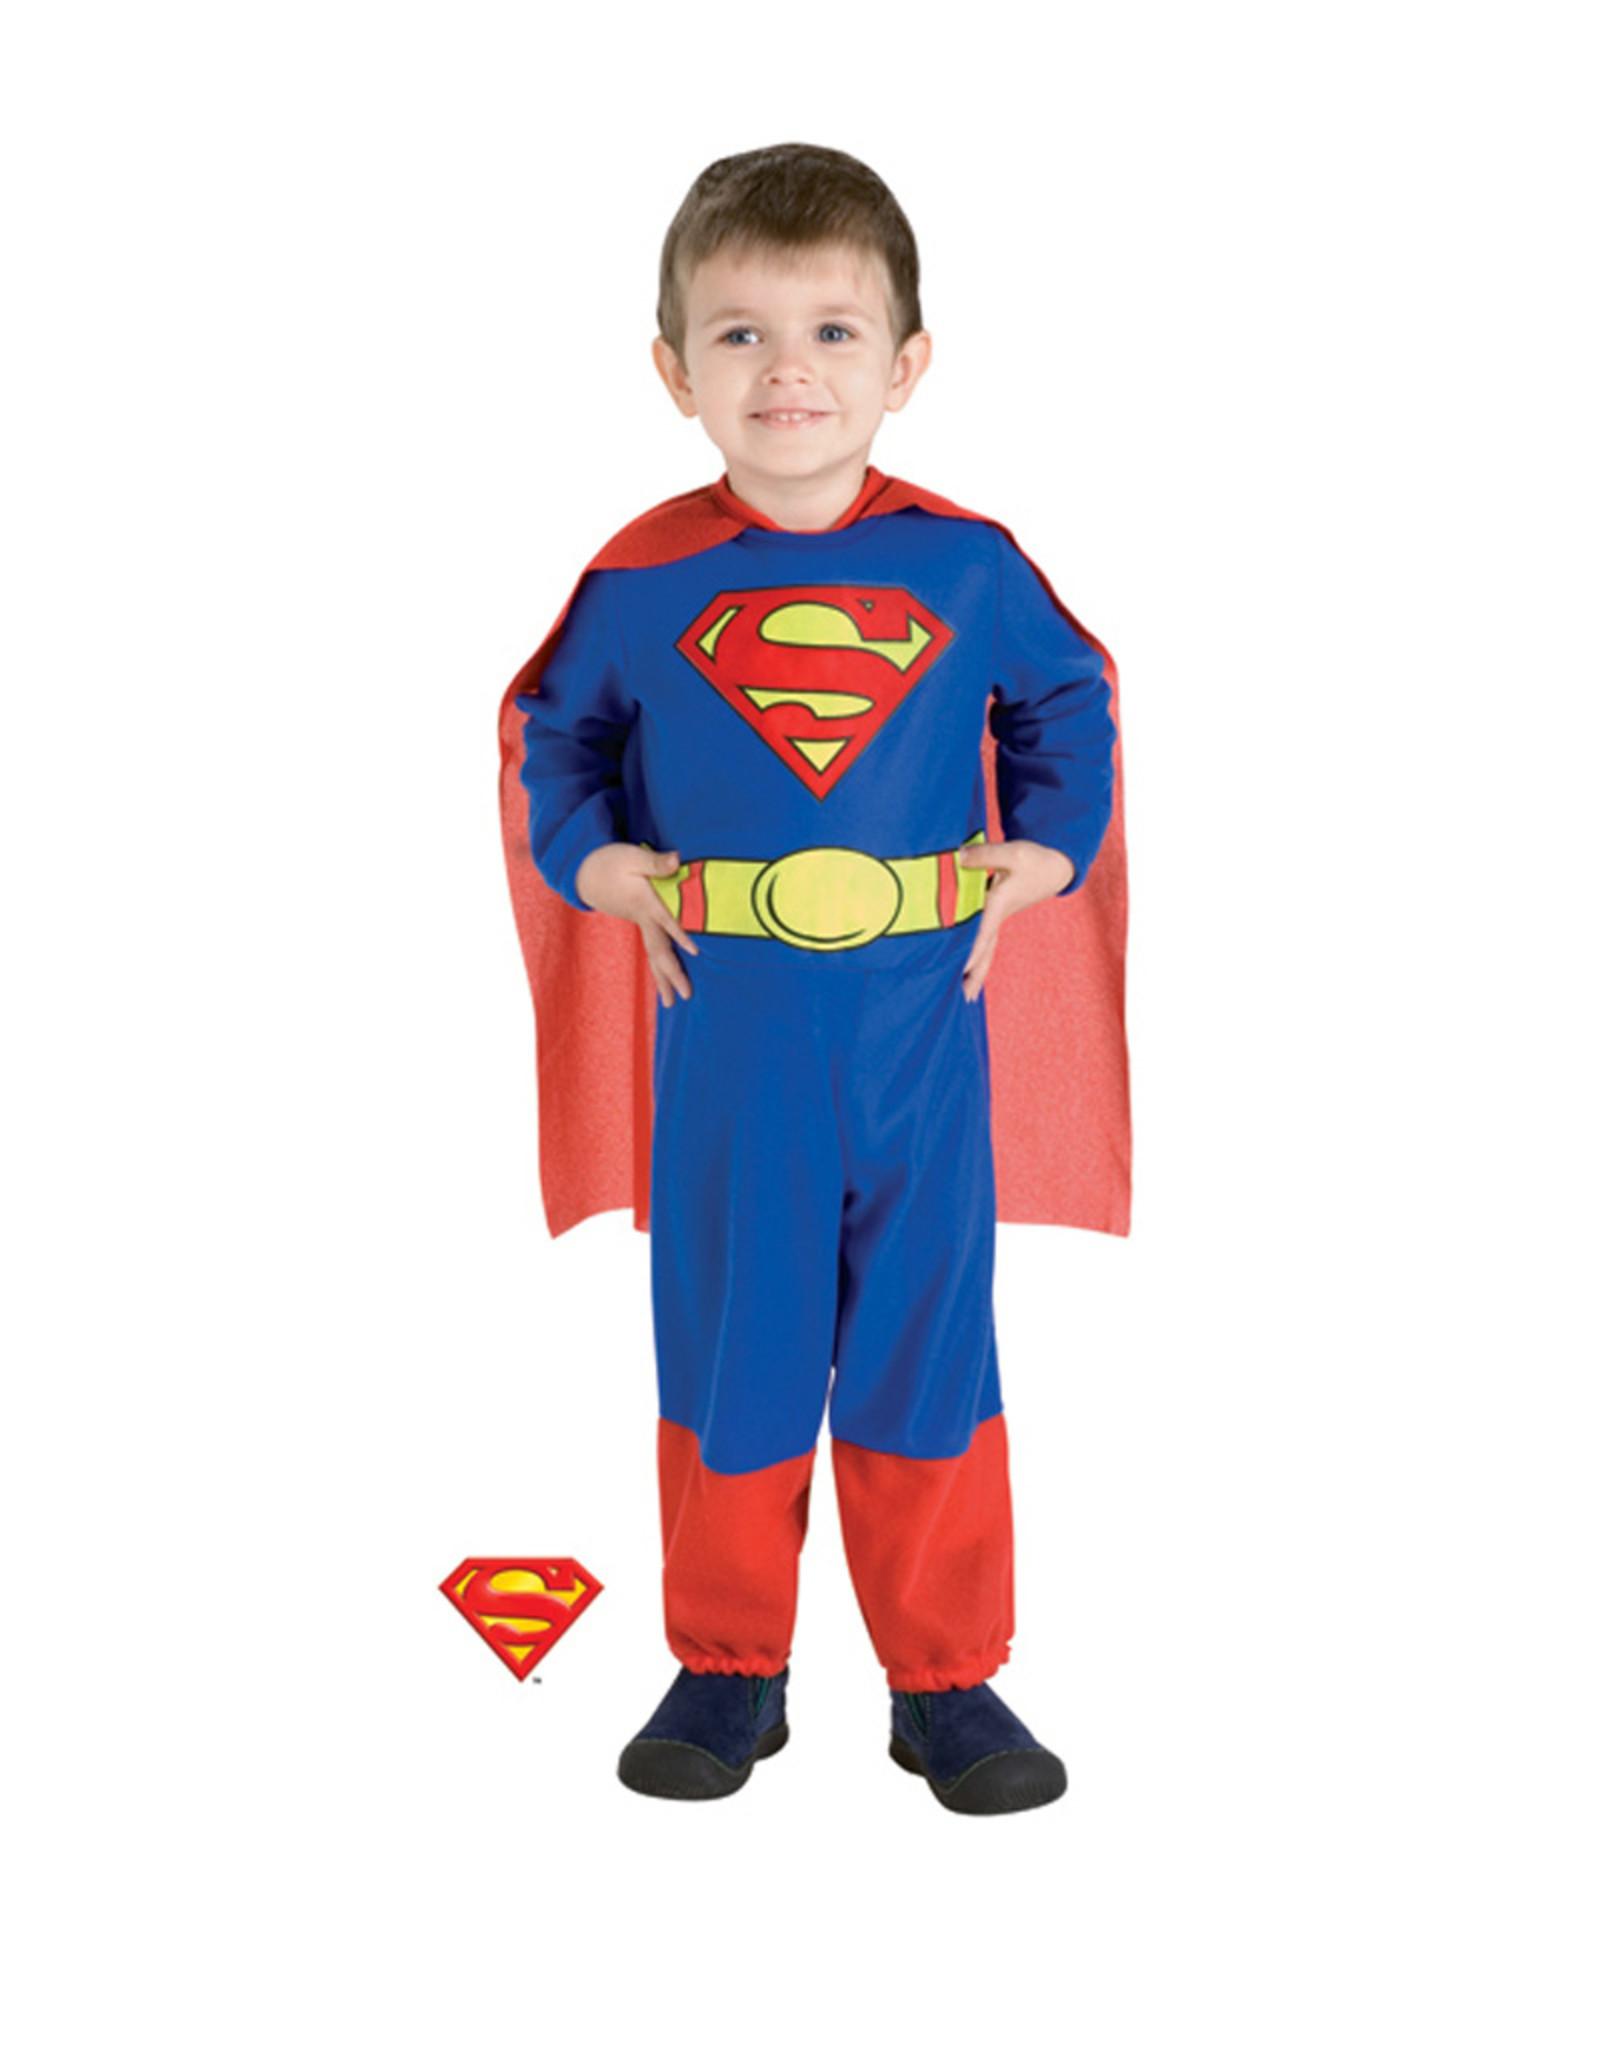 Superman Costume - Toddler